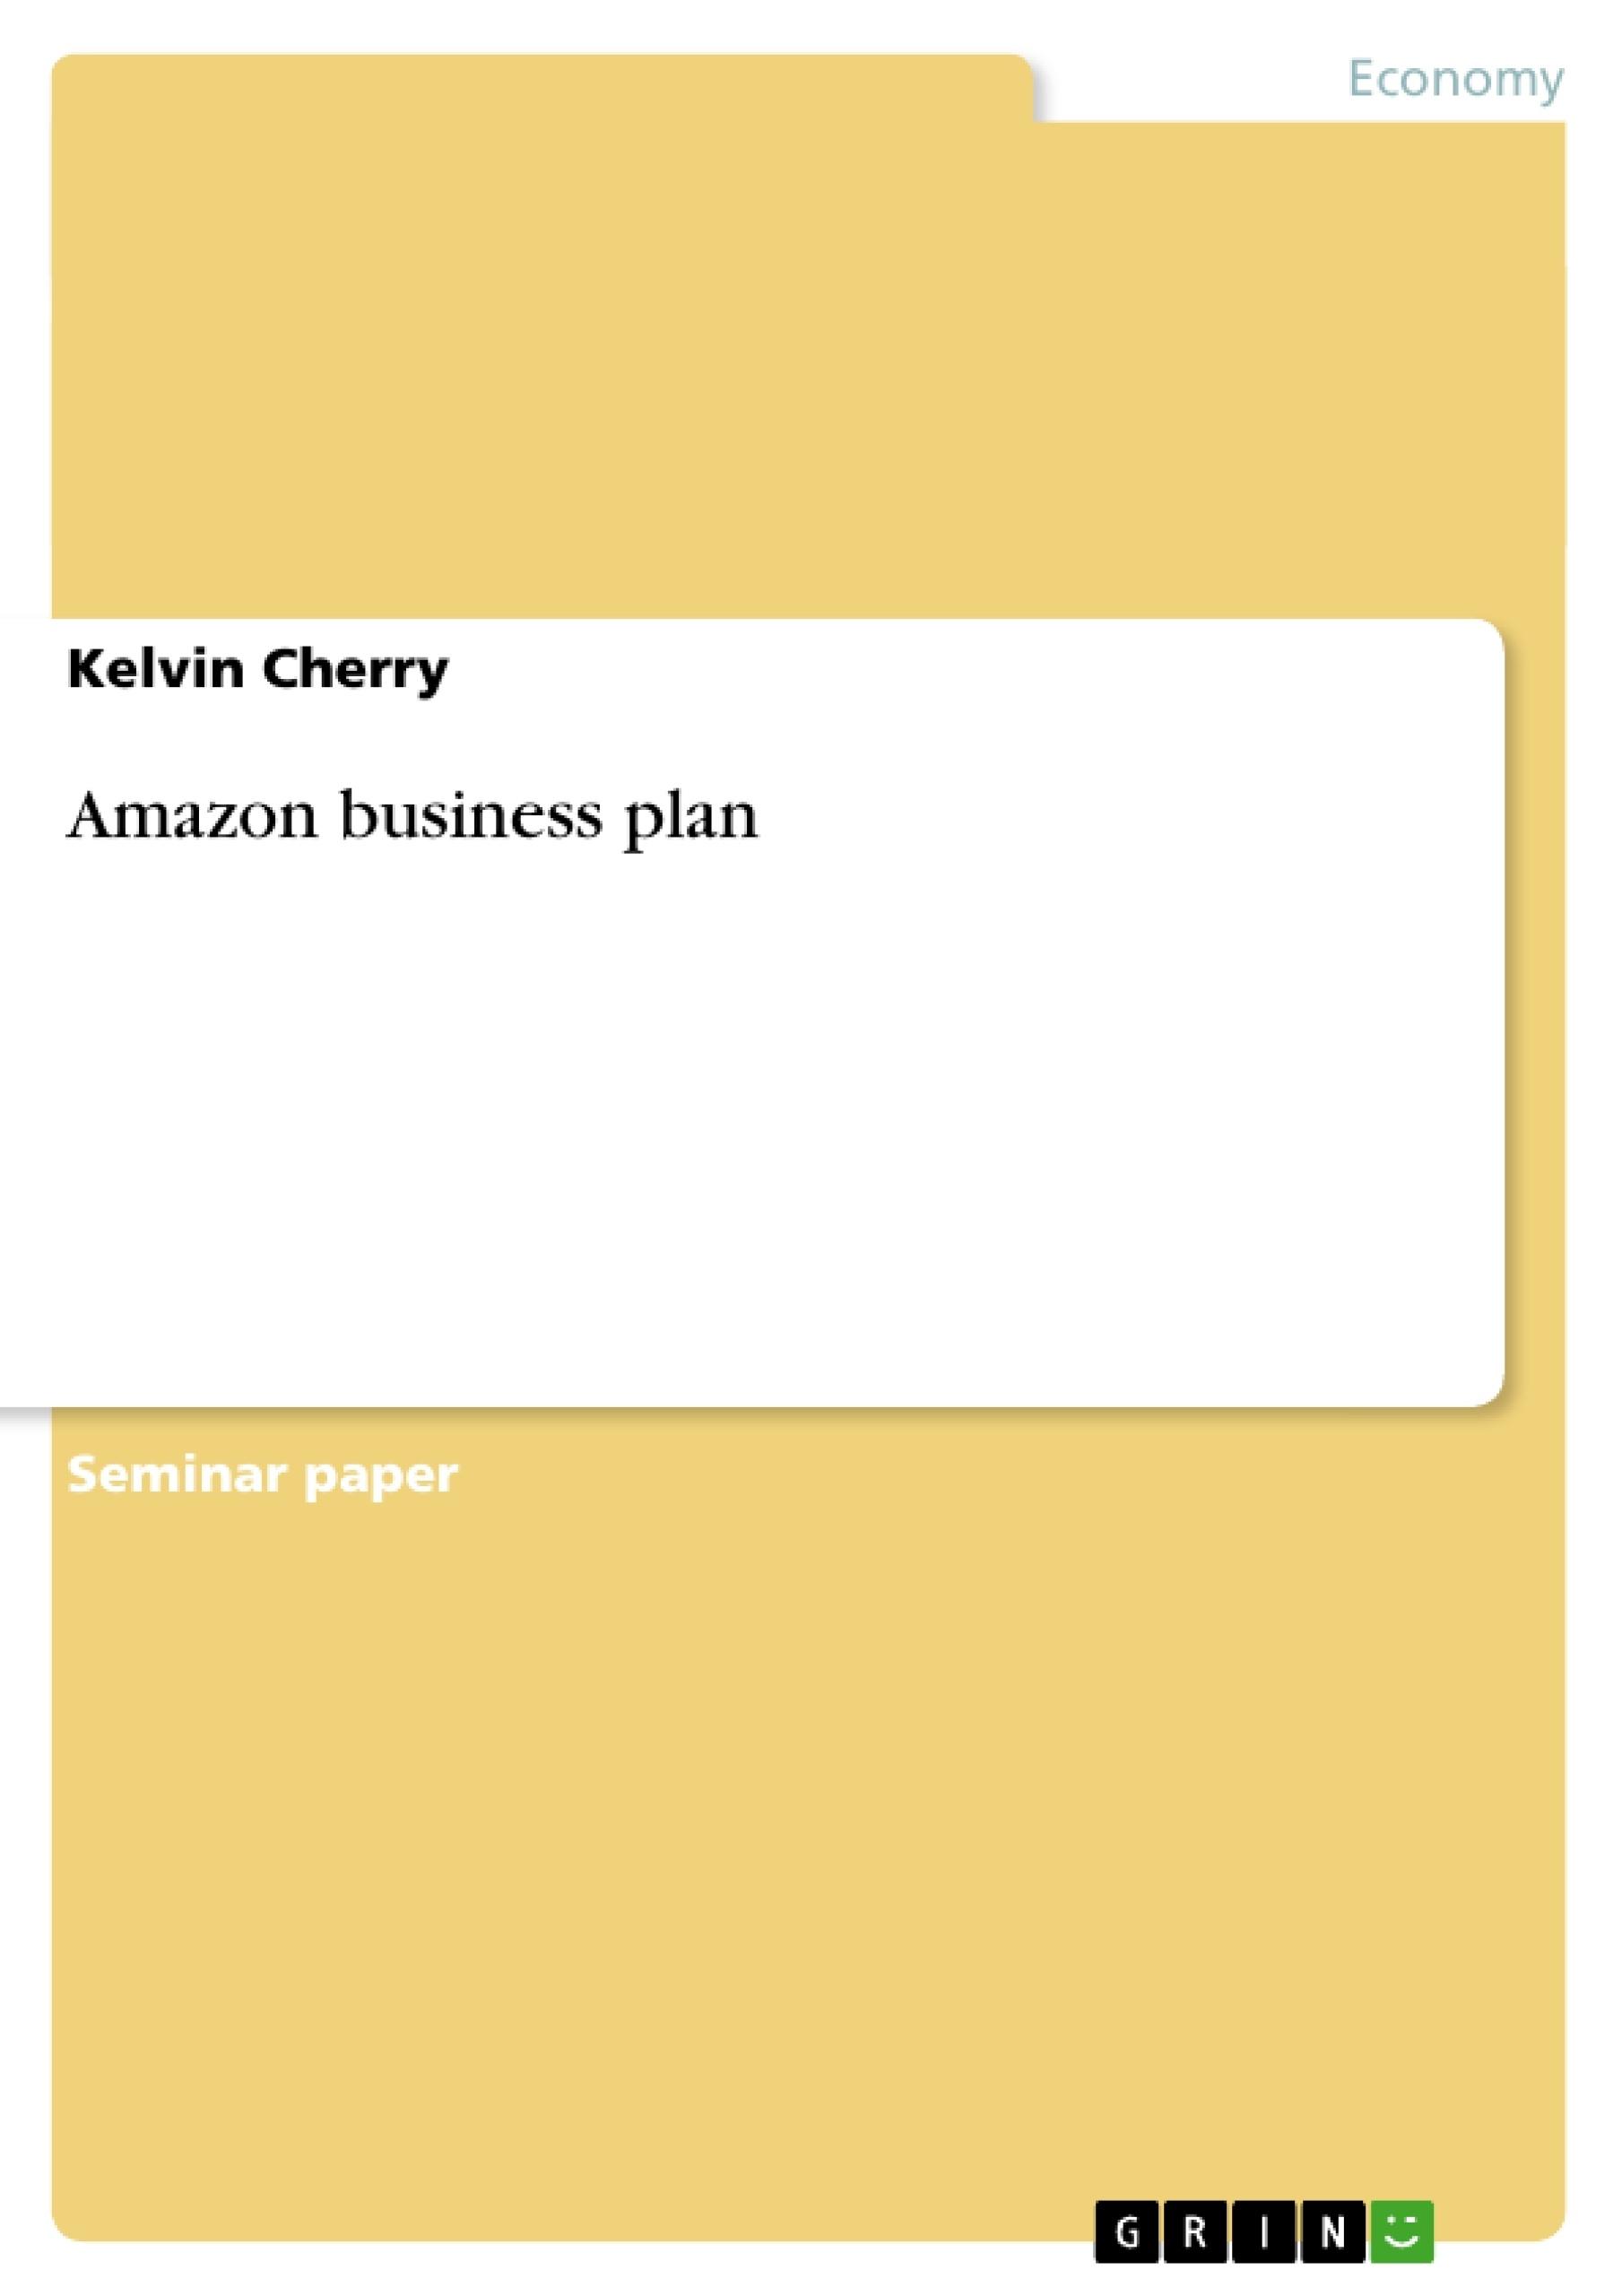 Title: Amazon business plan